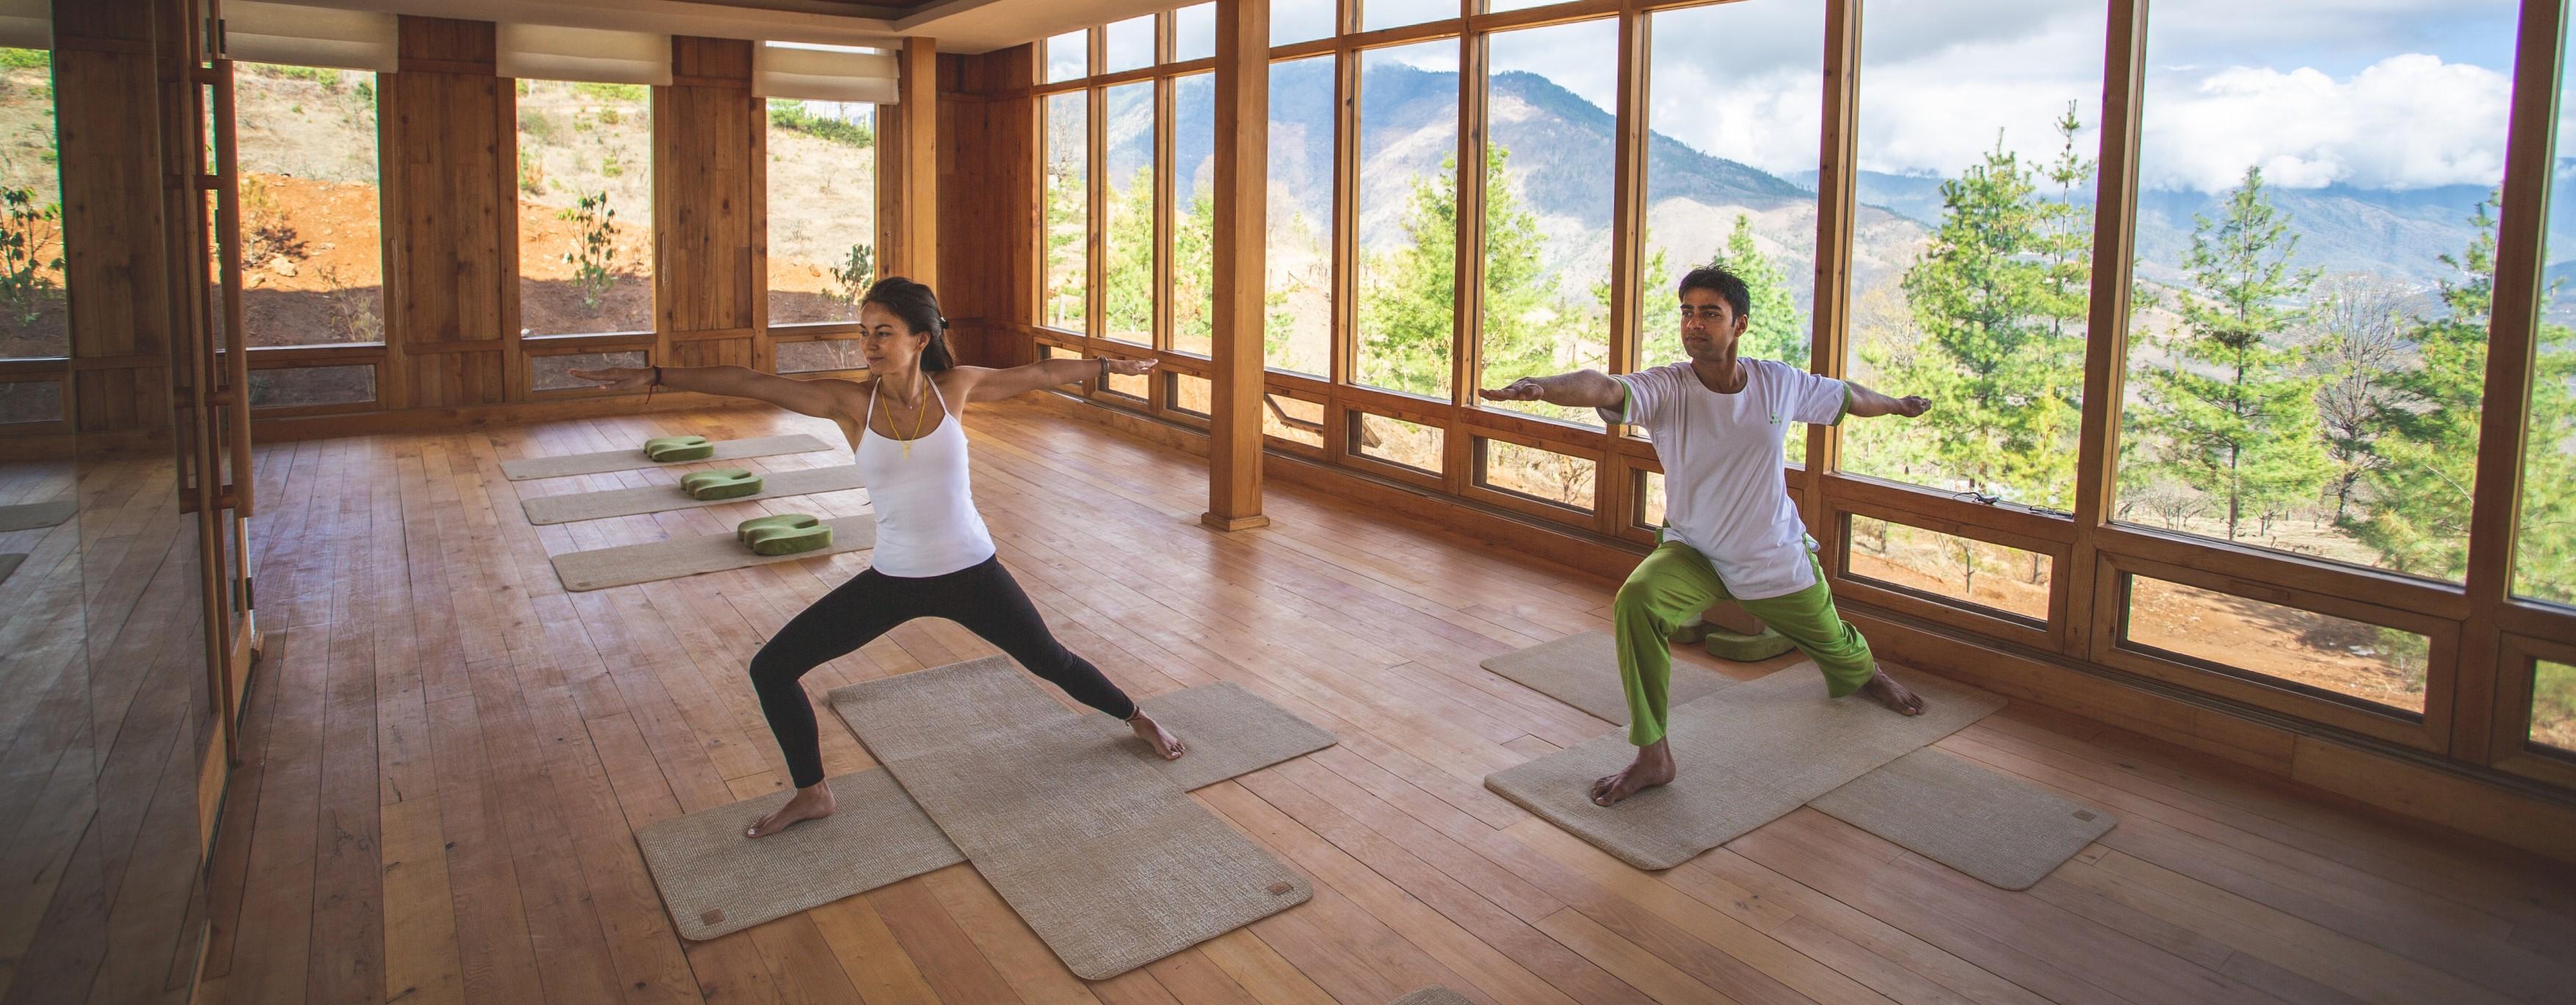 six-senses-thimphu-Yoga-studio